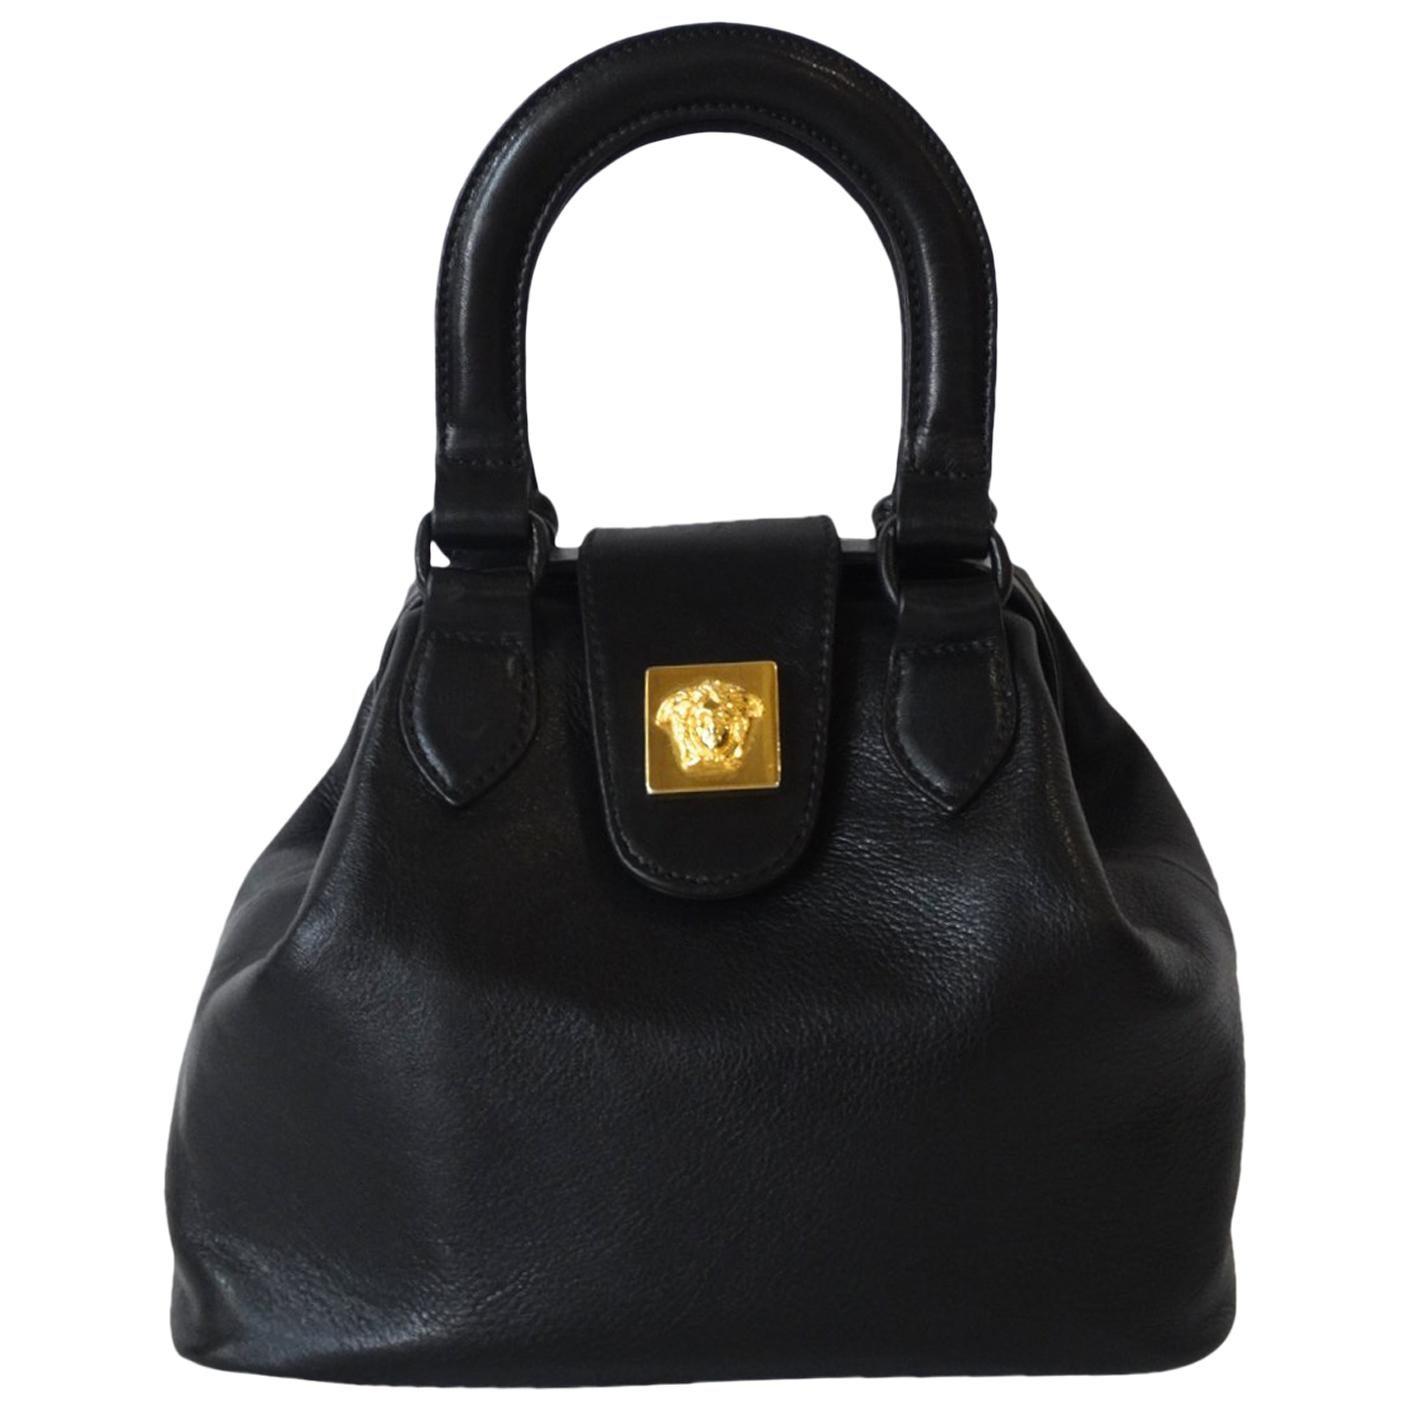 082656c3d7 Vintage gianni versace handbags and purses for sale at stdibs jpg 240x240  Versace vintage handbags